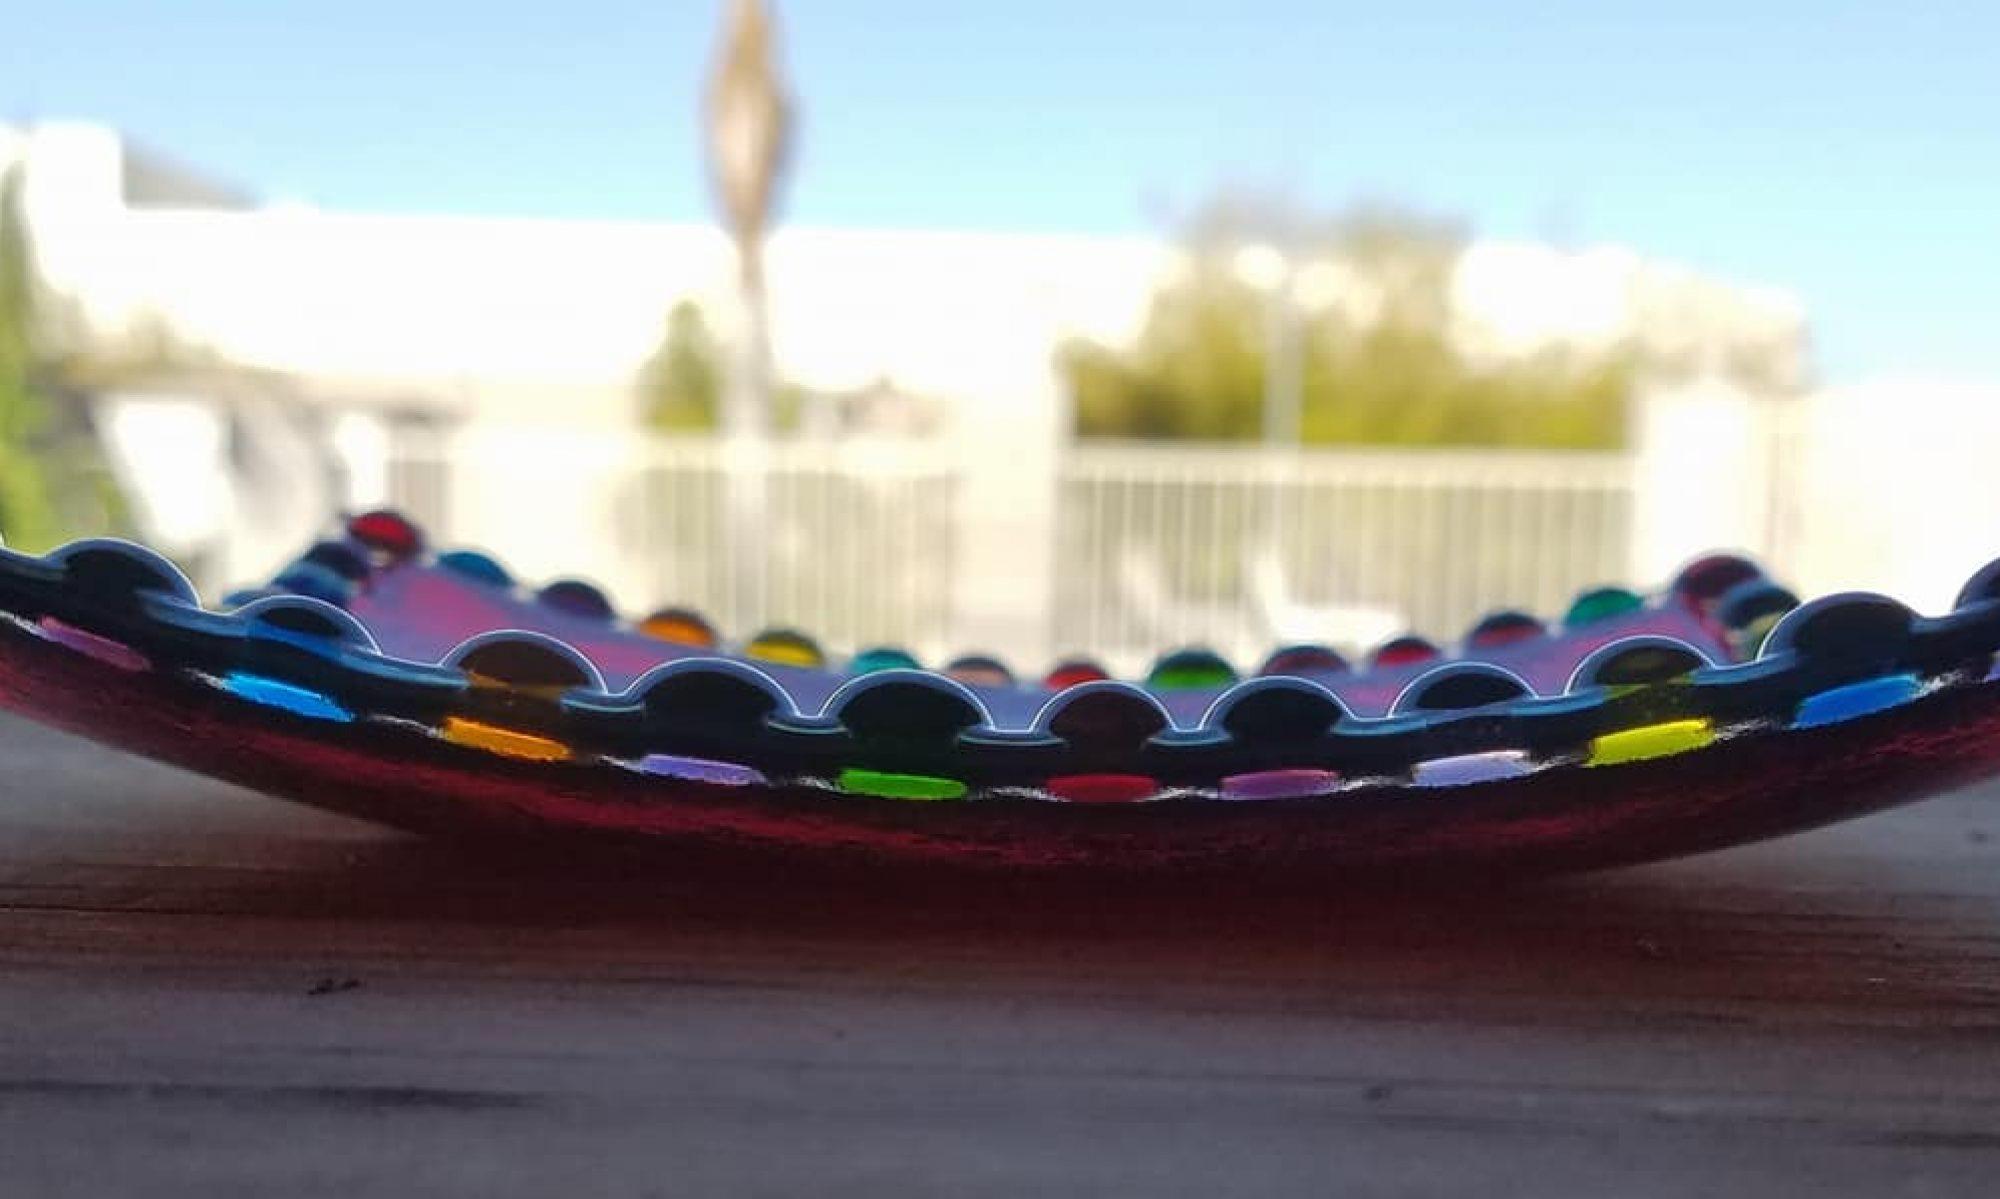 GlassMelts